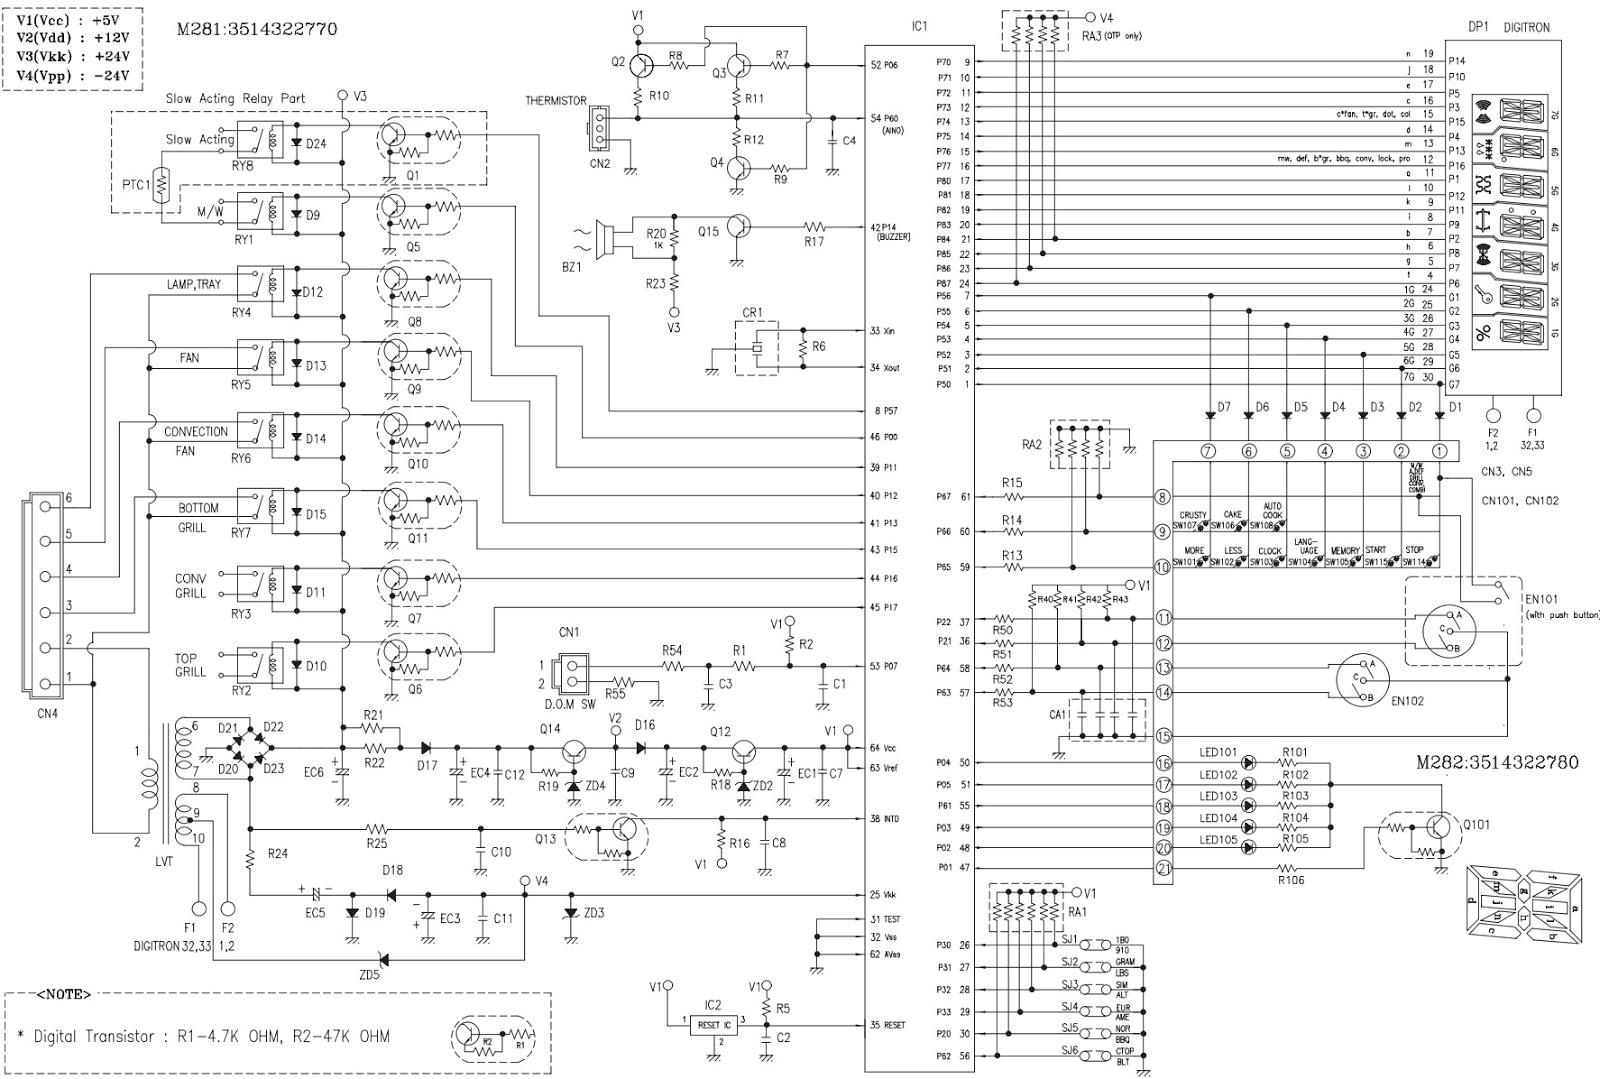 medium resolution of 2000 daewoo lanos stereo wiring diagram scion xa diagram white 2000 daewoo lanos 2001 daewoo lanos